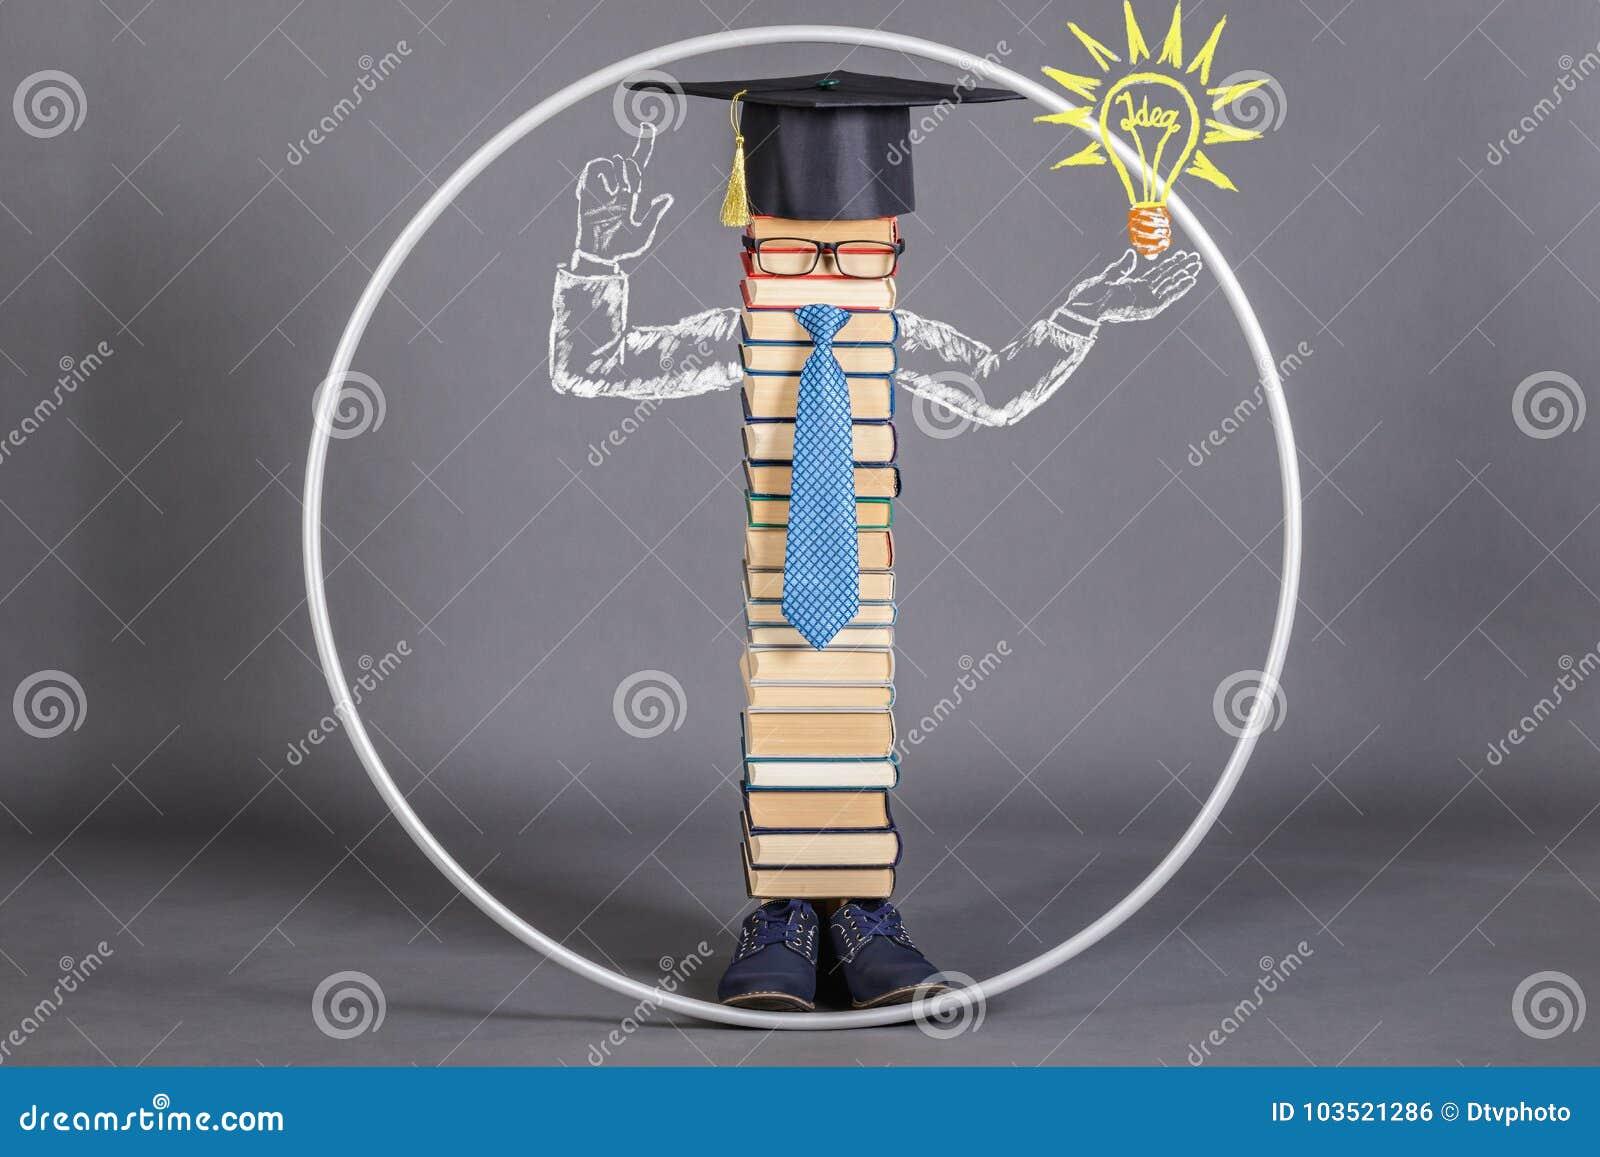 A modern educated intelligent Vitruvian man, beyond the scope of